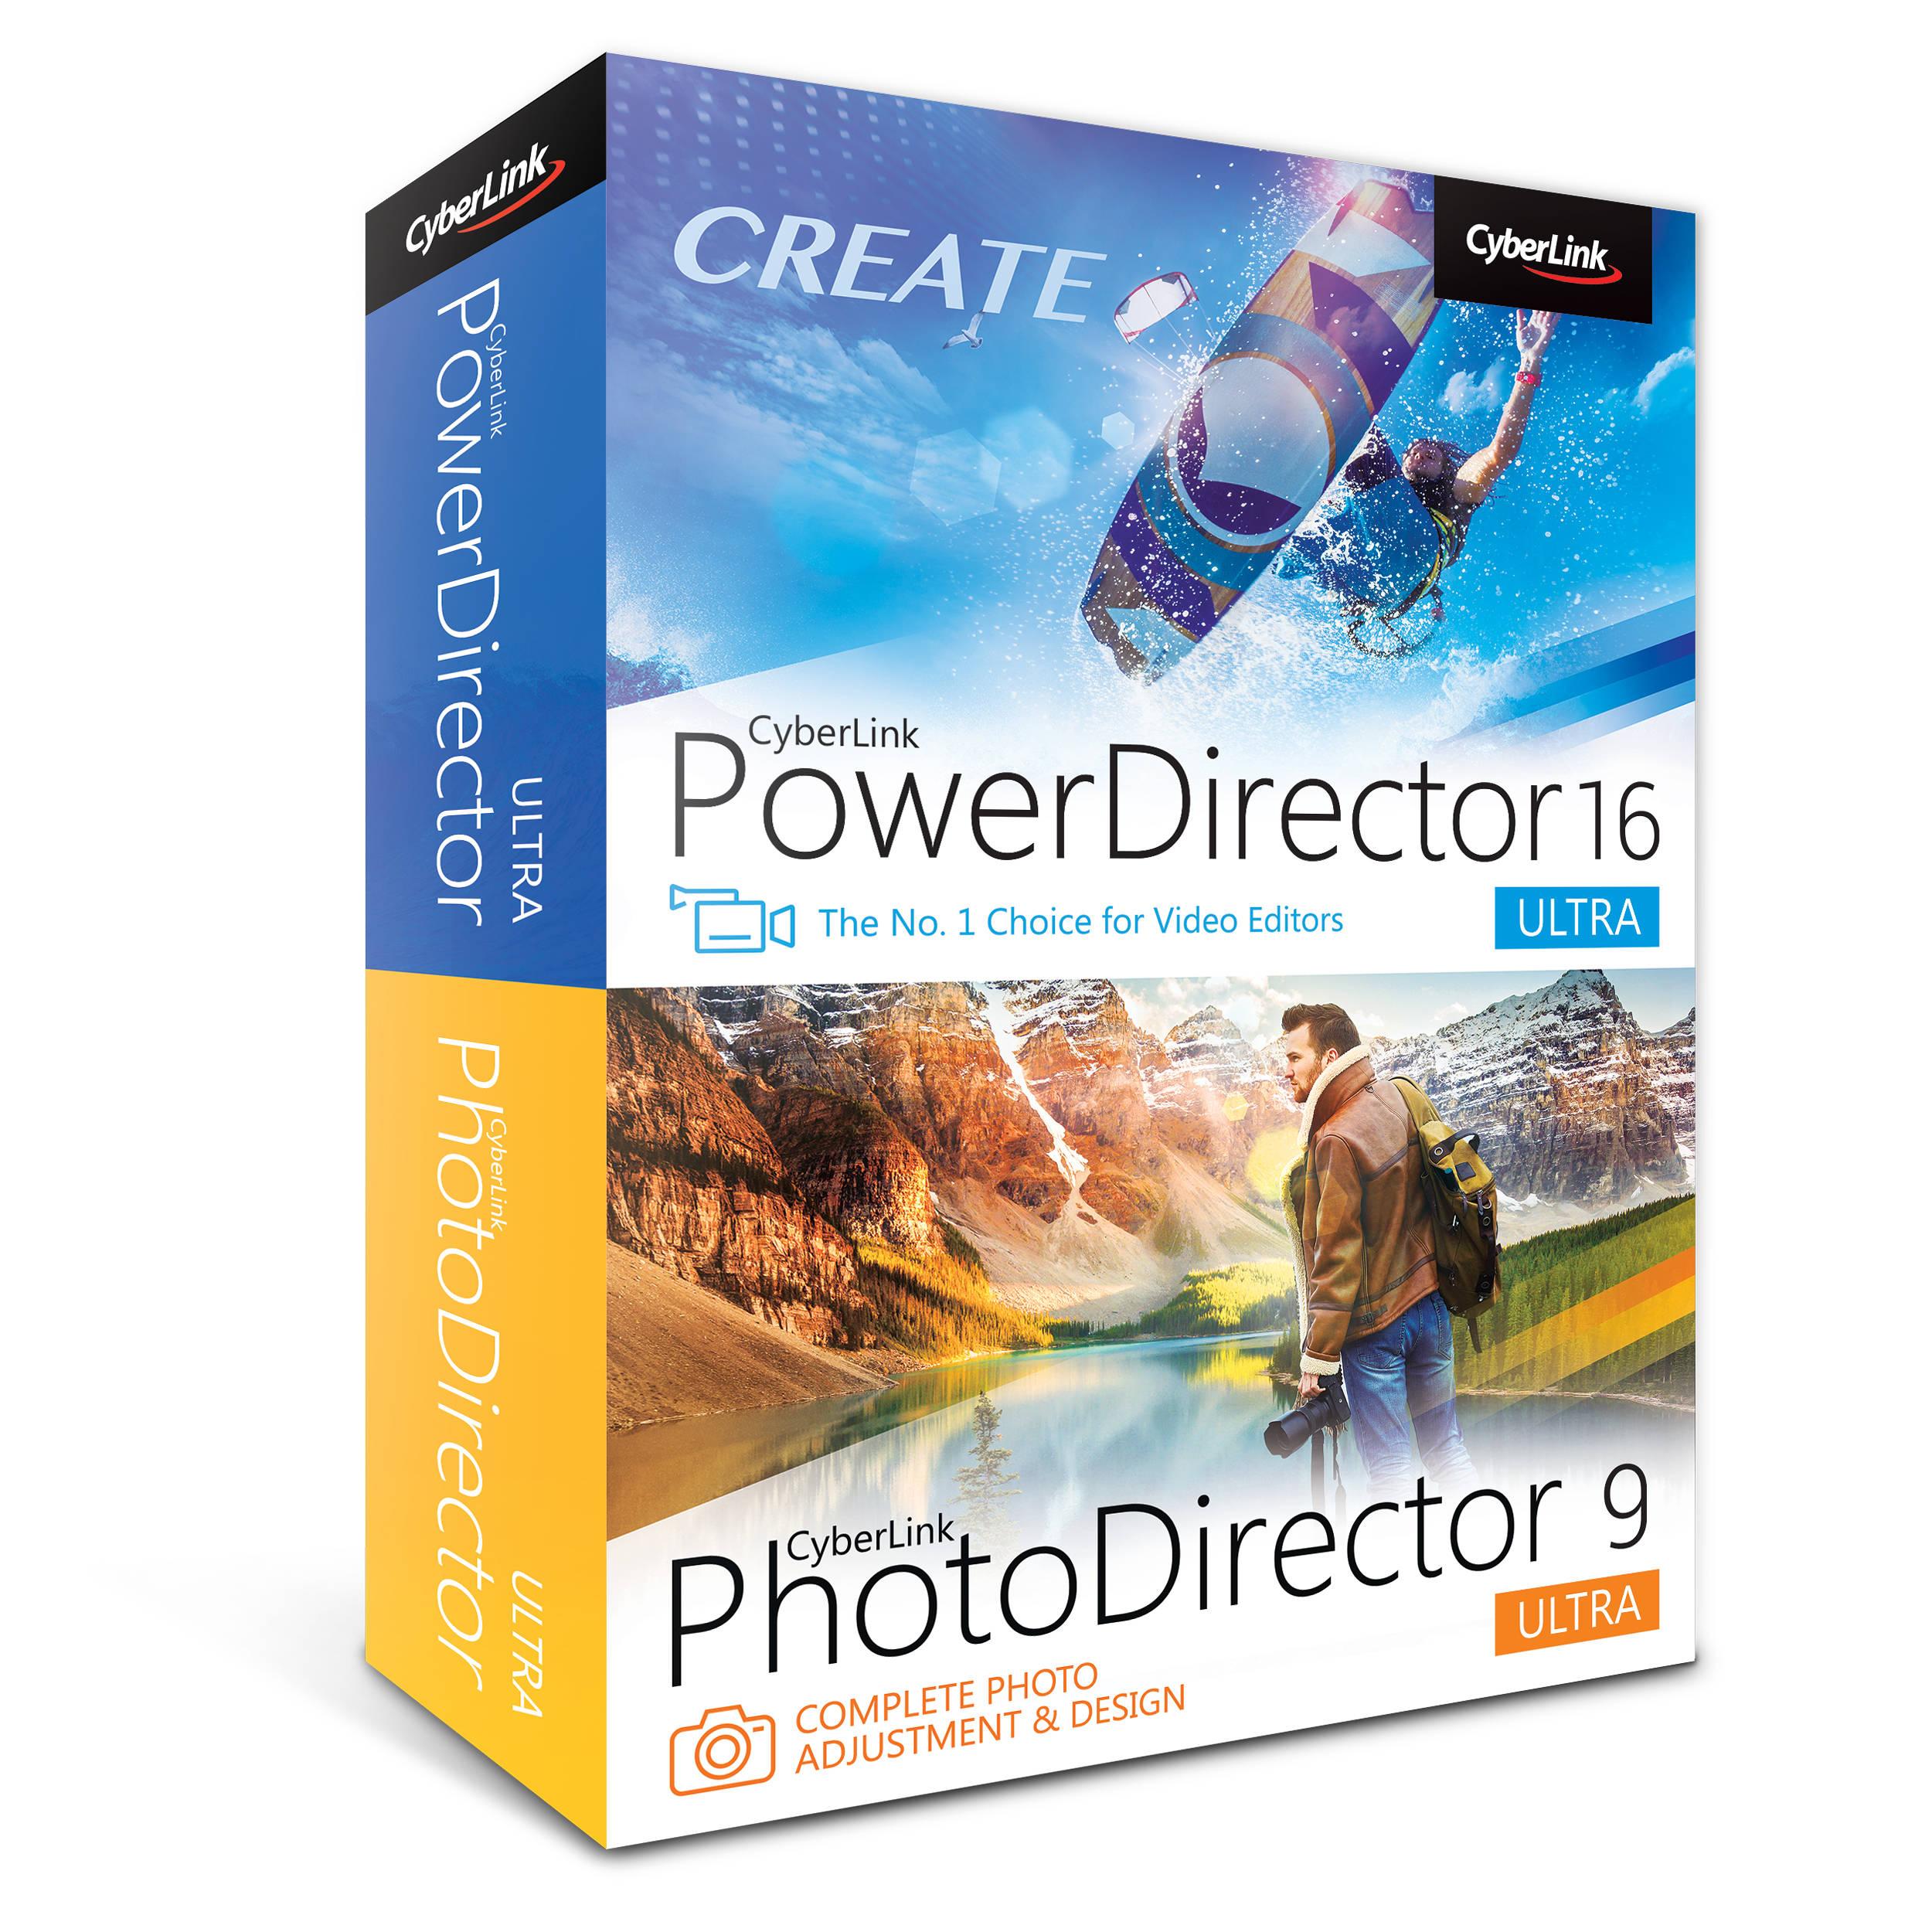 CyberLink PowerDirector 16 Ultra & PhotoDirector 9 Ultra (DVD)